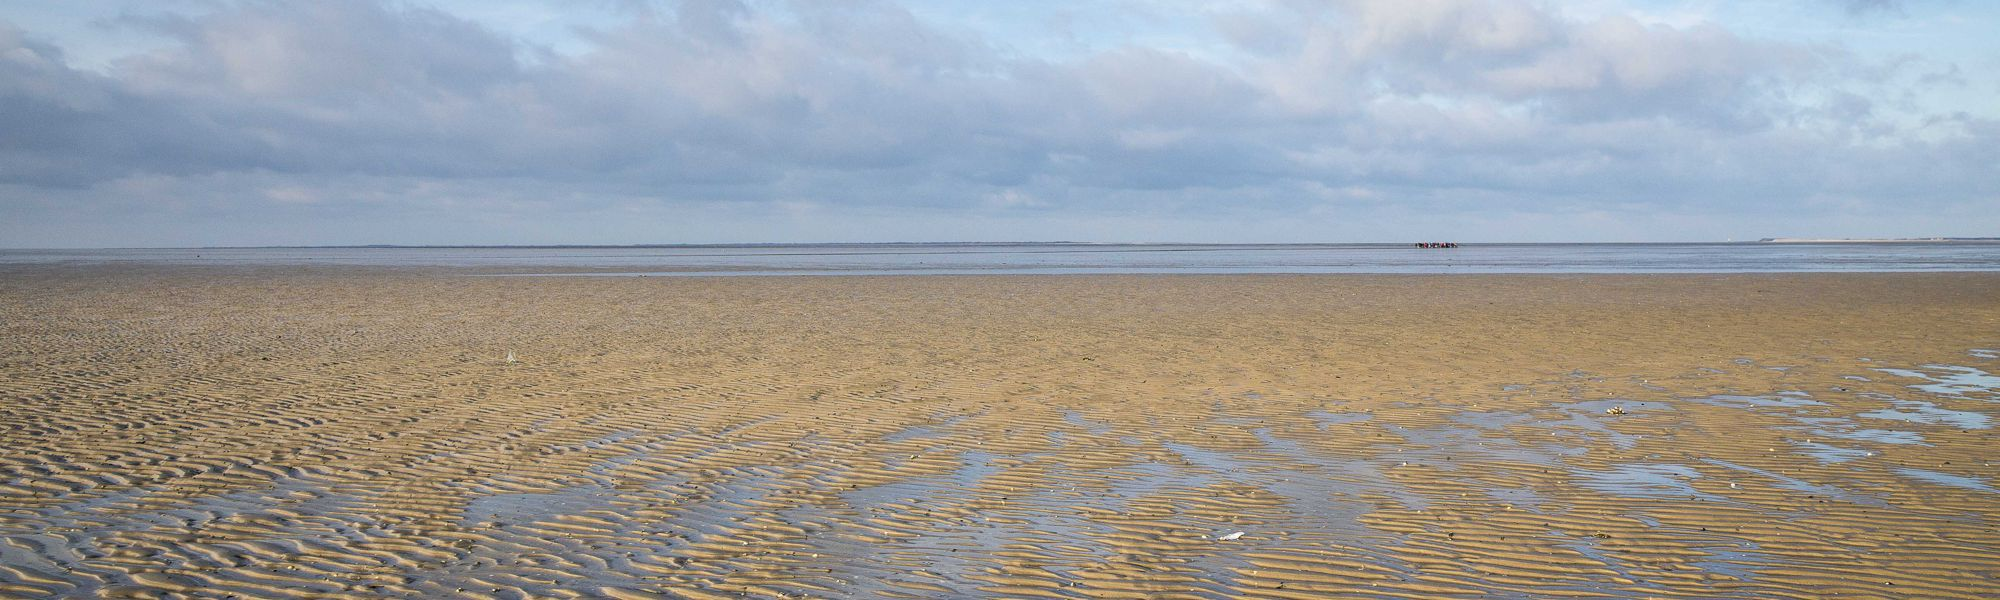 Thalasso Wattenmeer Nordsee